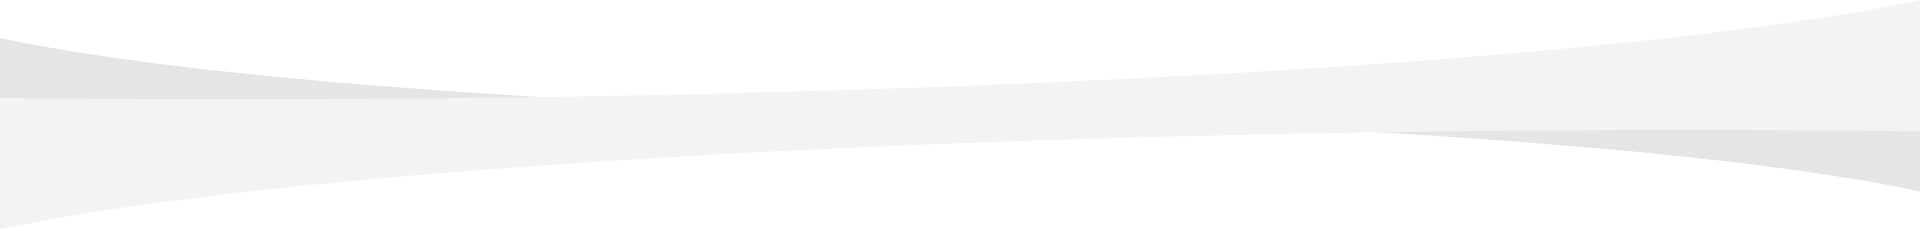 USAN Grey Divider